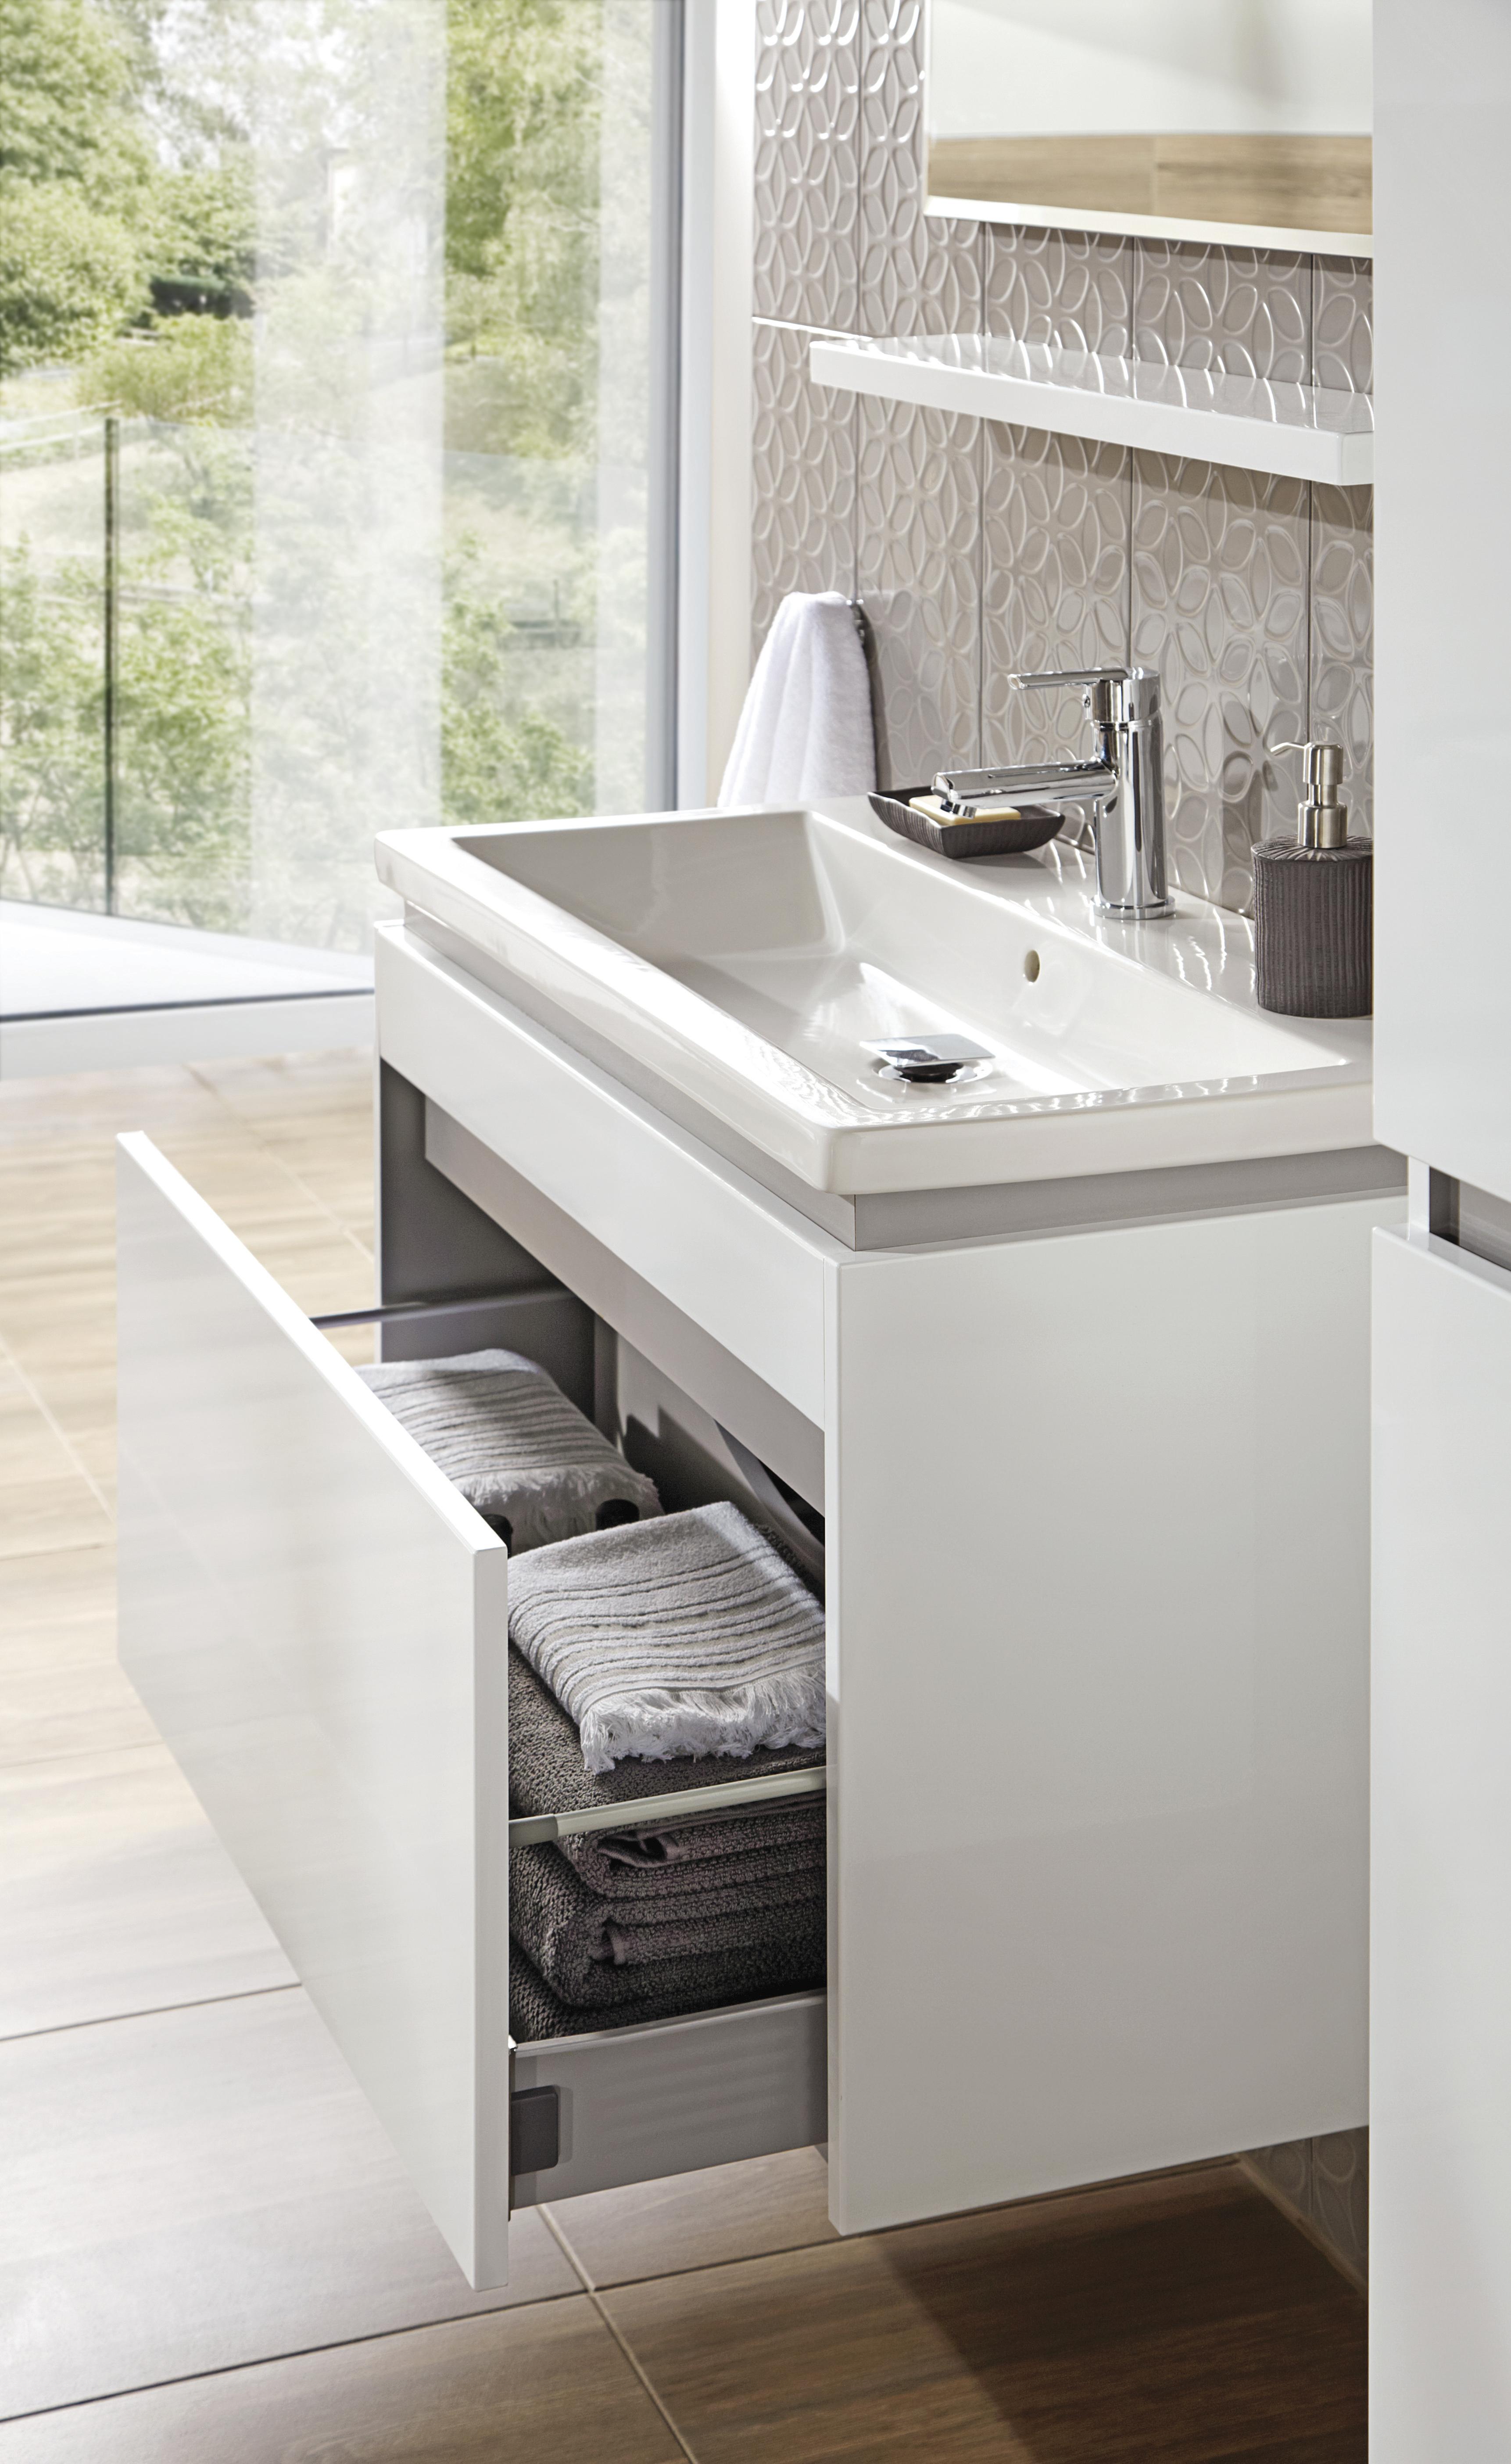 badmöbel - badezimmer badmoebel komplett set - badshop, baushop, Badezimmer ideen